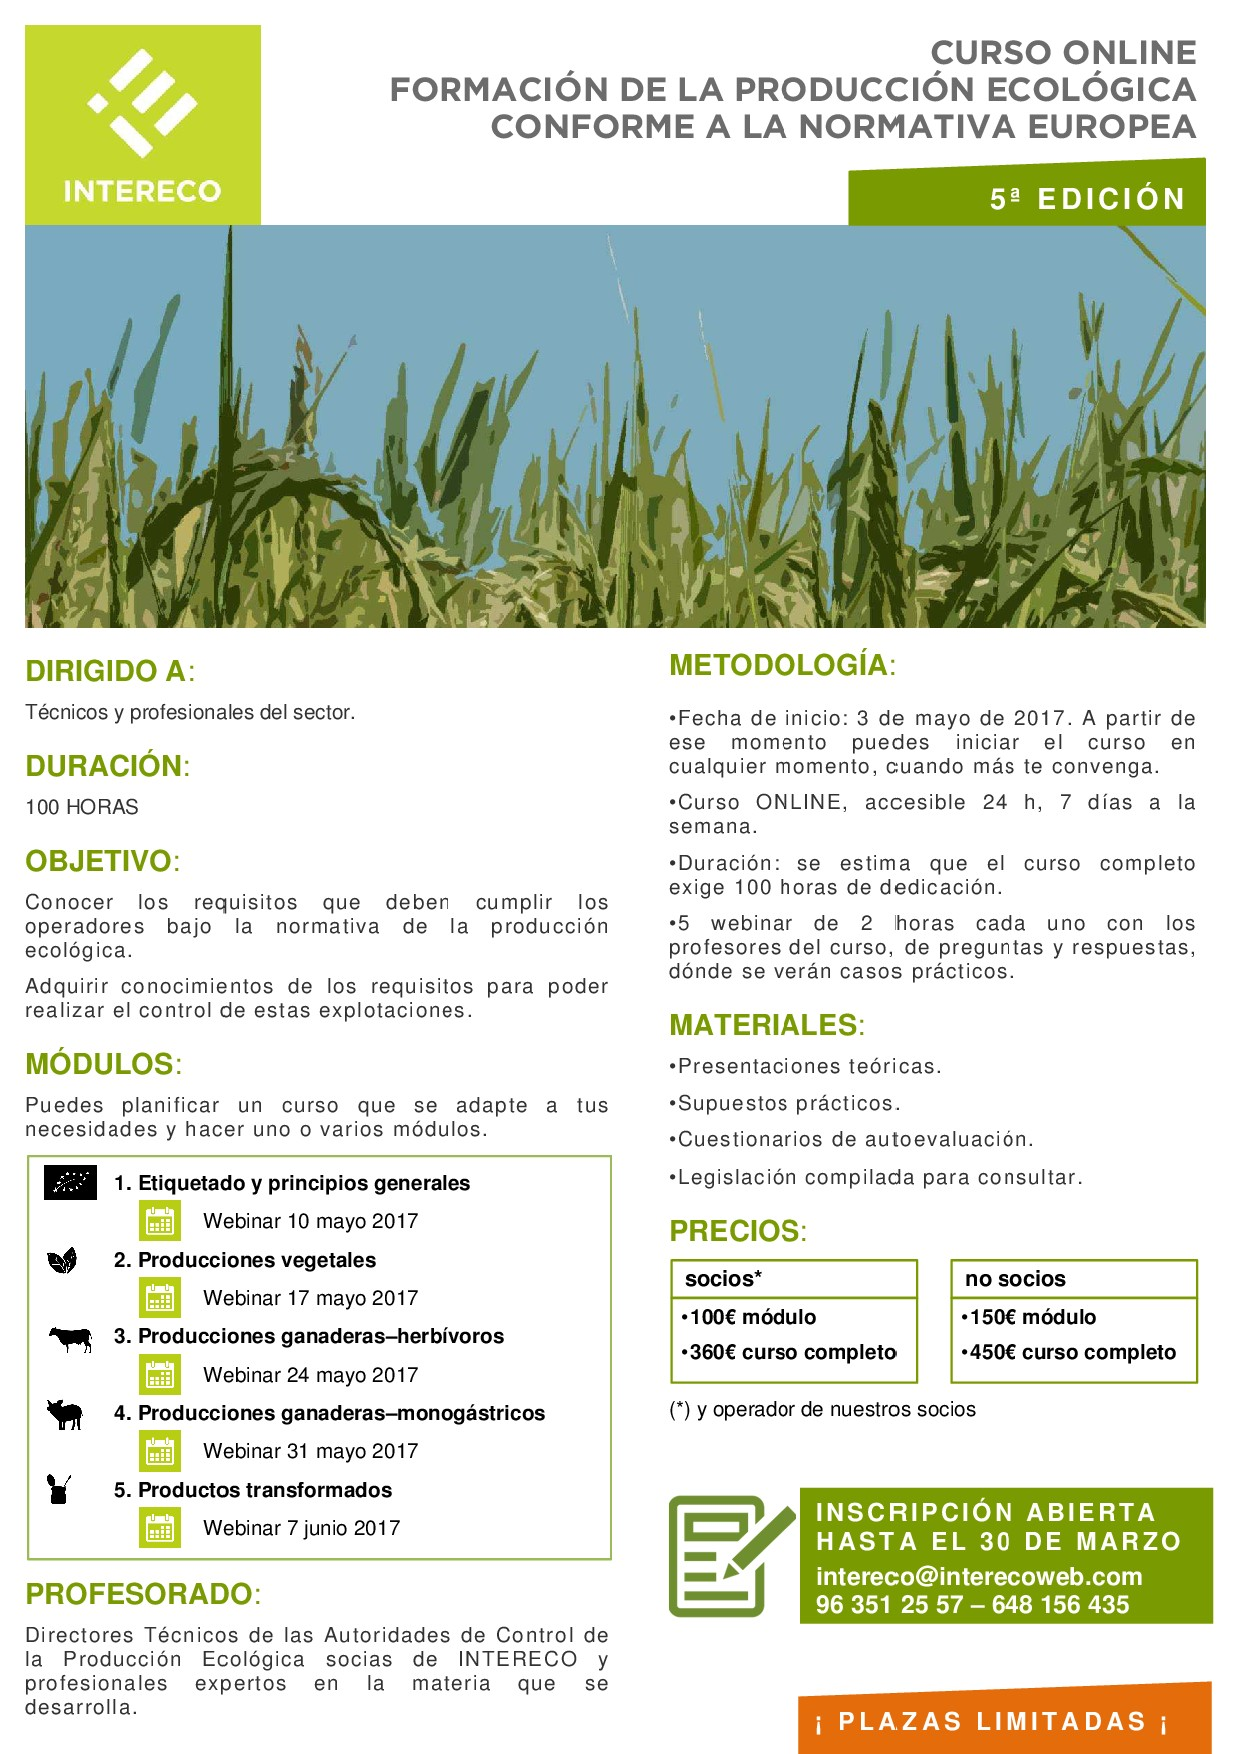 Programa Producción eco. 5ª edición